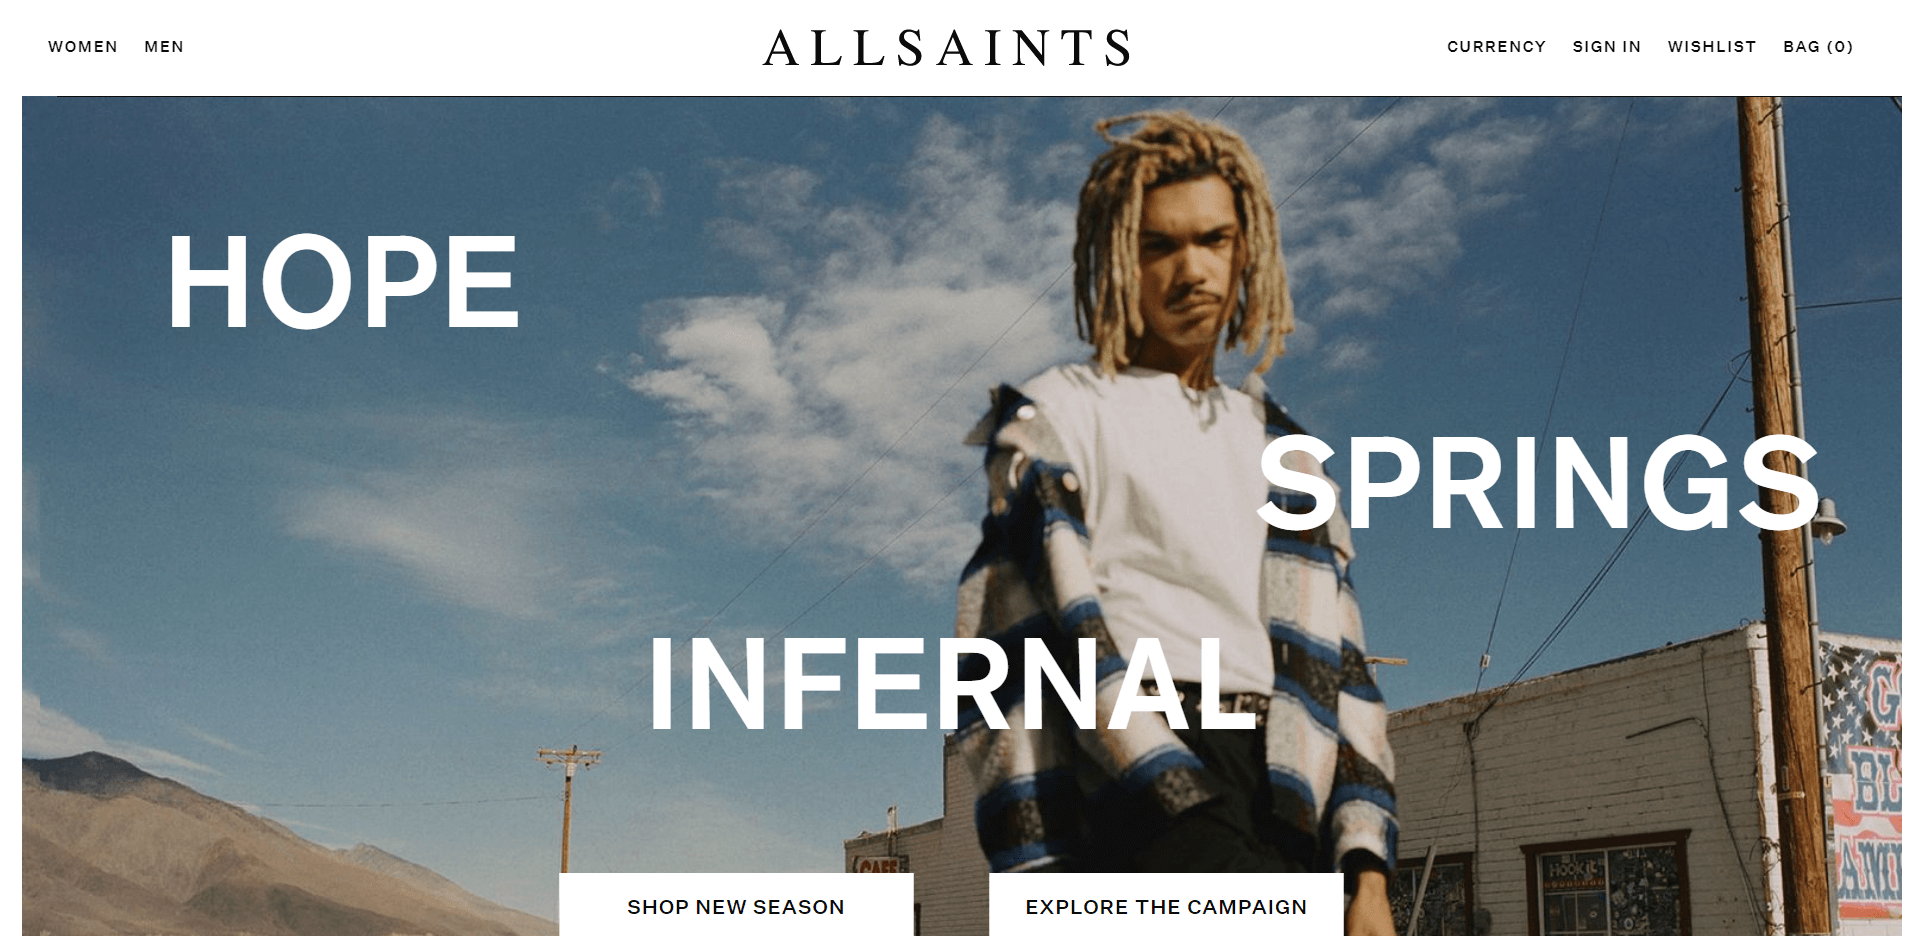 An artistic layout communicating AllSaint's alternative, artistic brand identity.